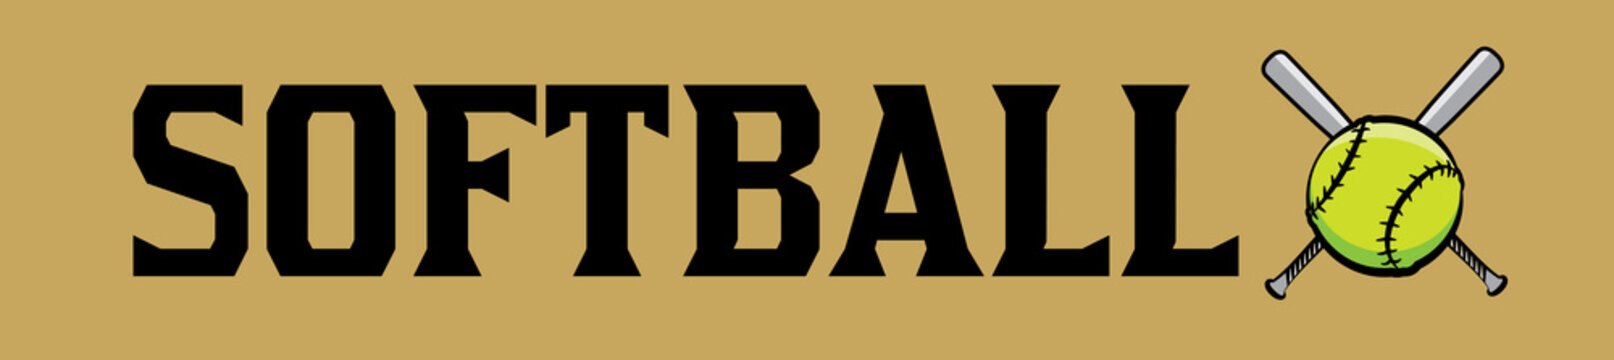 Softball and Ball Word Art Banner Illustration